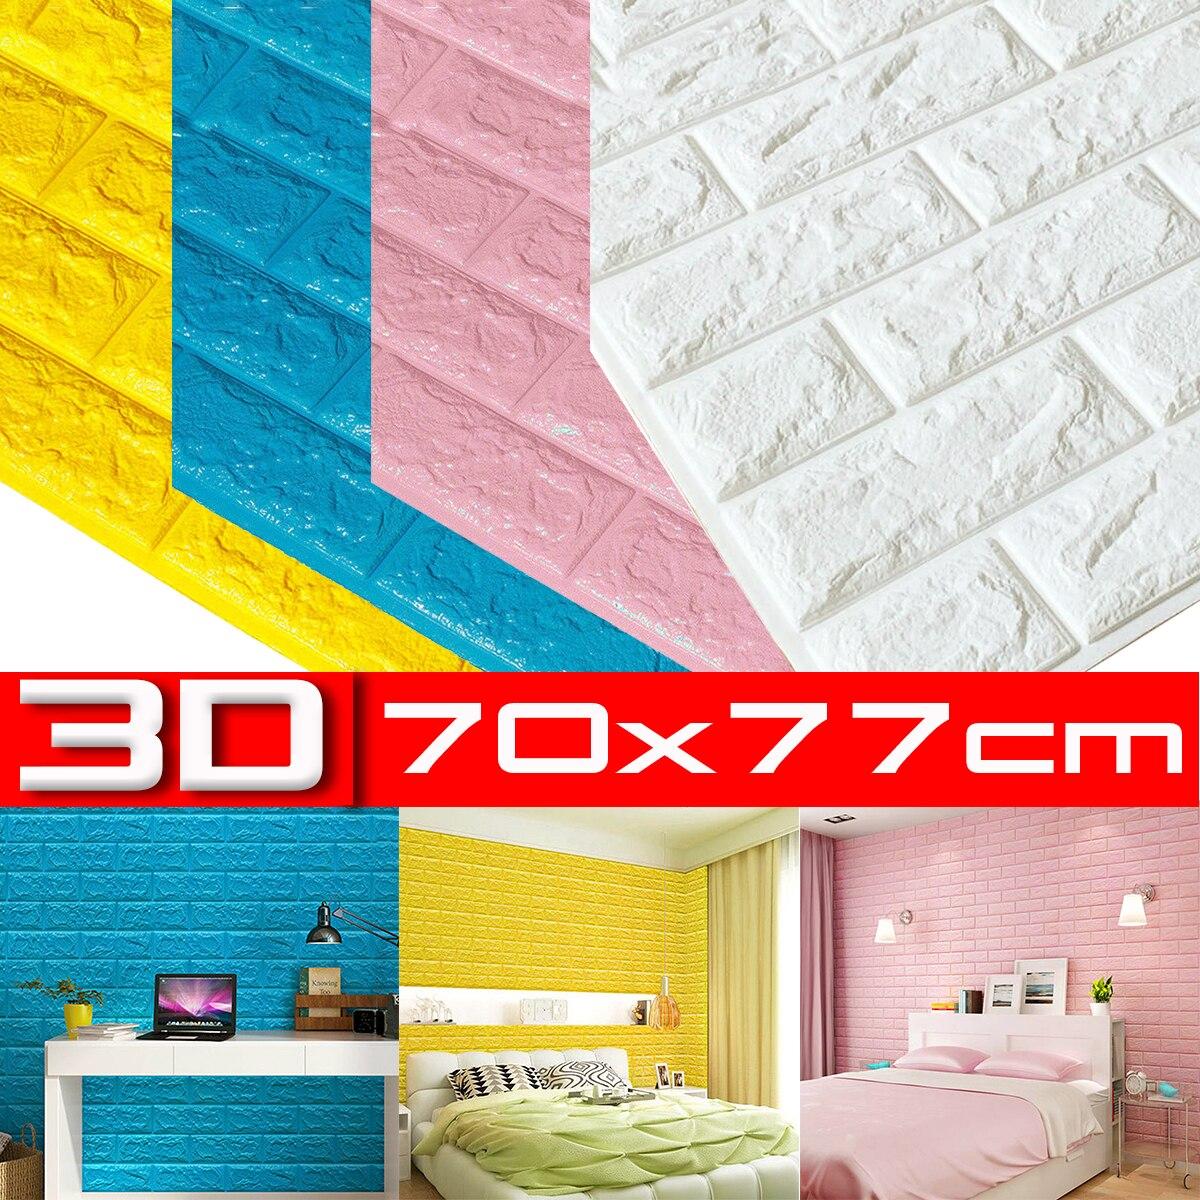 10Pcs 70x77x0.6cm Brick Wall Stickers DIY Decor Self-Adhesive Waterproof Wallpaper For Kids Room Bedroom 3D Wall Sticker Brick